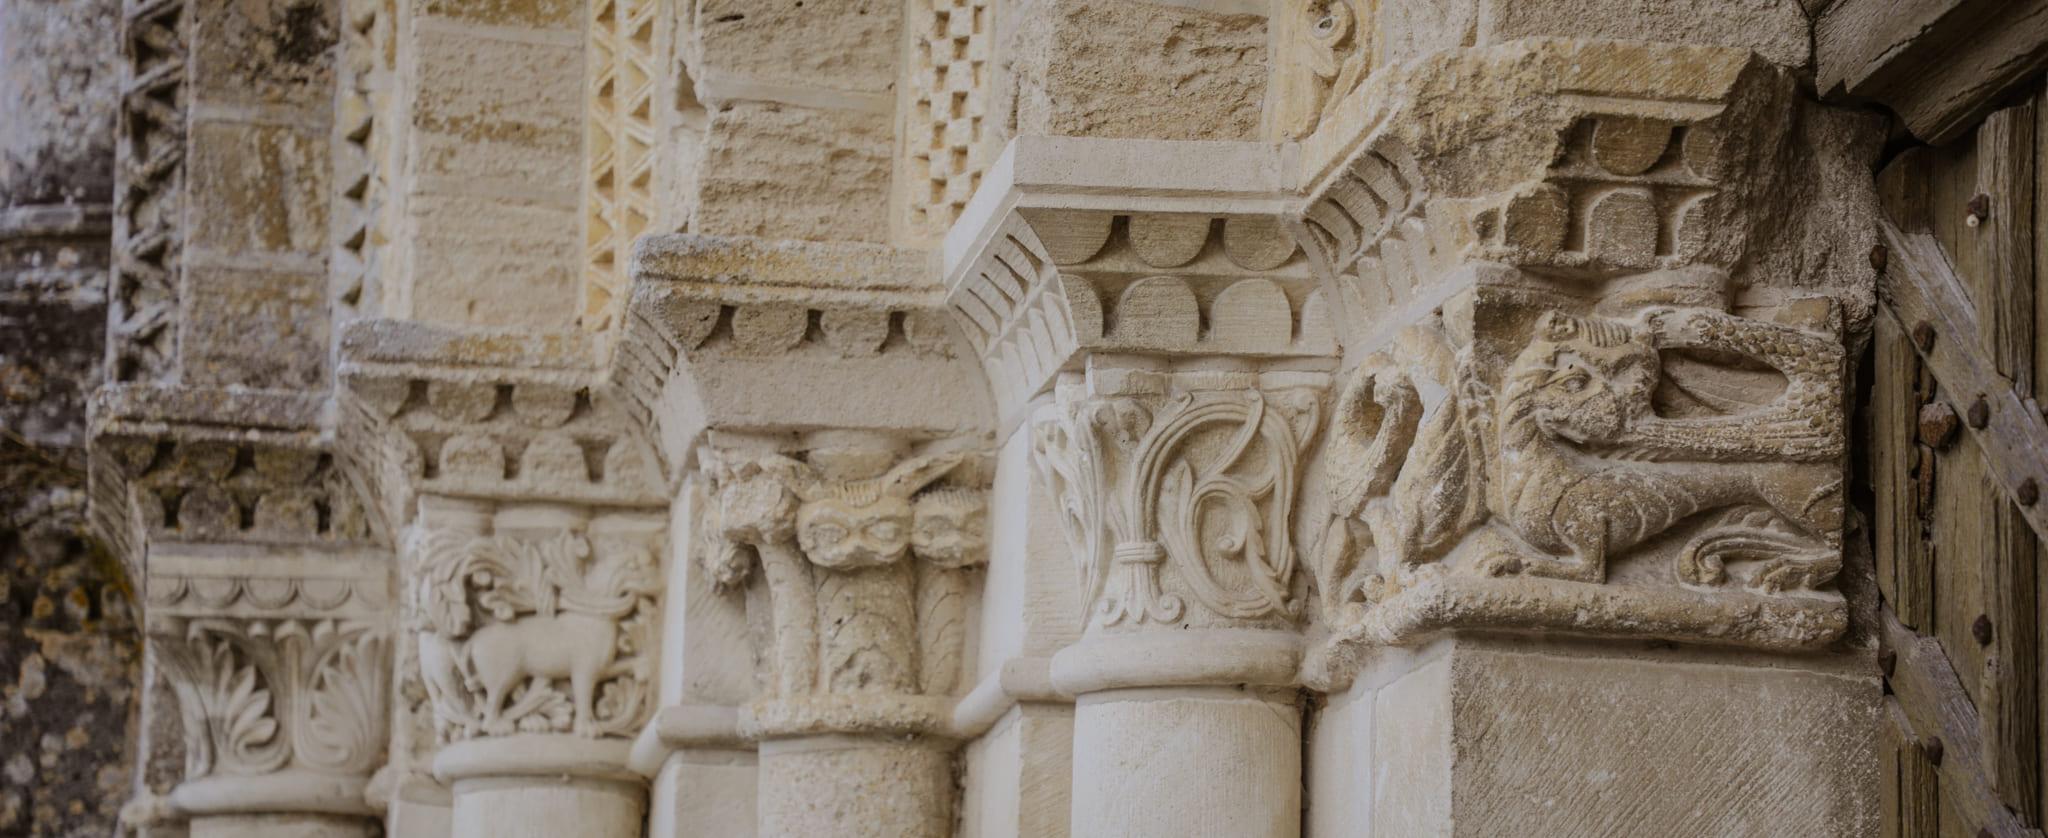 Abbaye - St Amant de Boixe